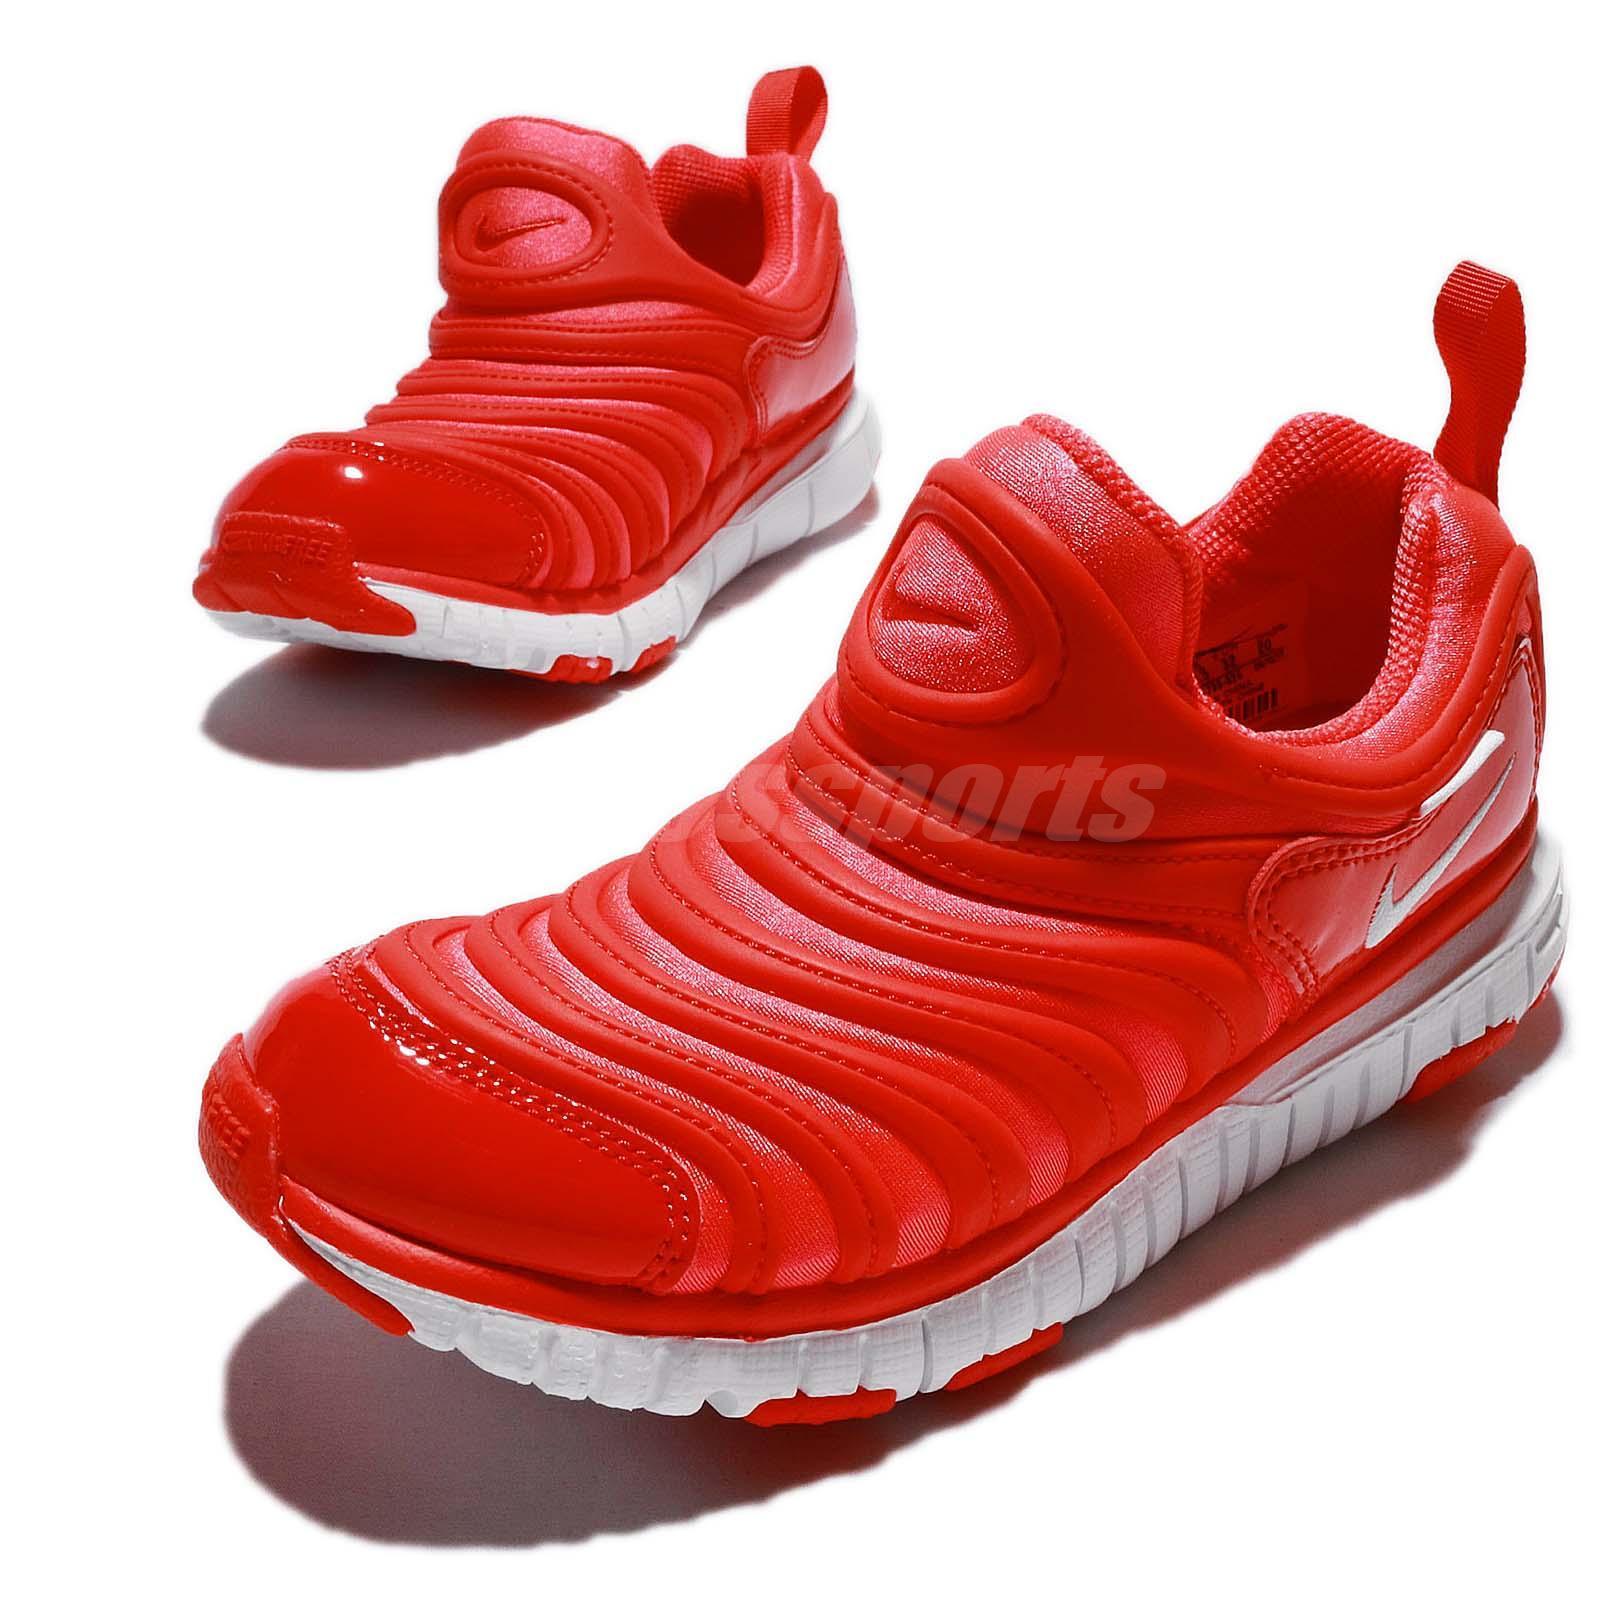 3d7a5747d1395 ... canada nike dynamo free ps bright crimson preschool kids shoes sneakers  343738 624 32a1a 4e303